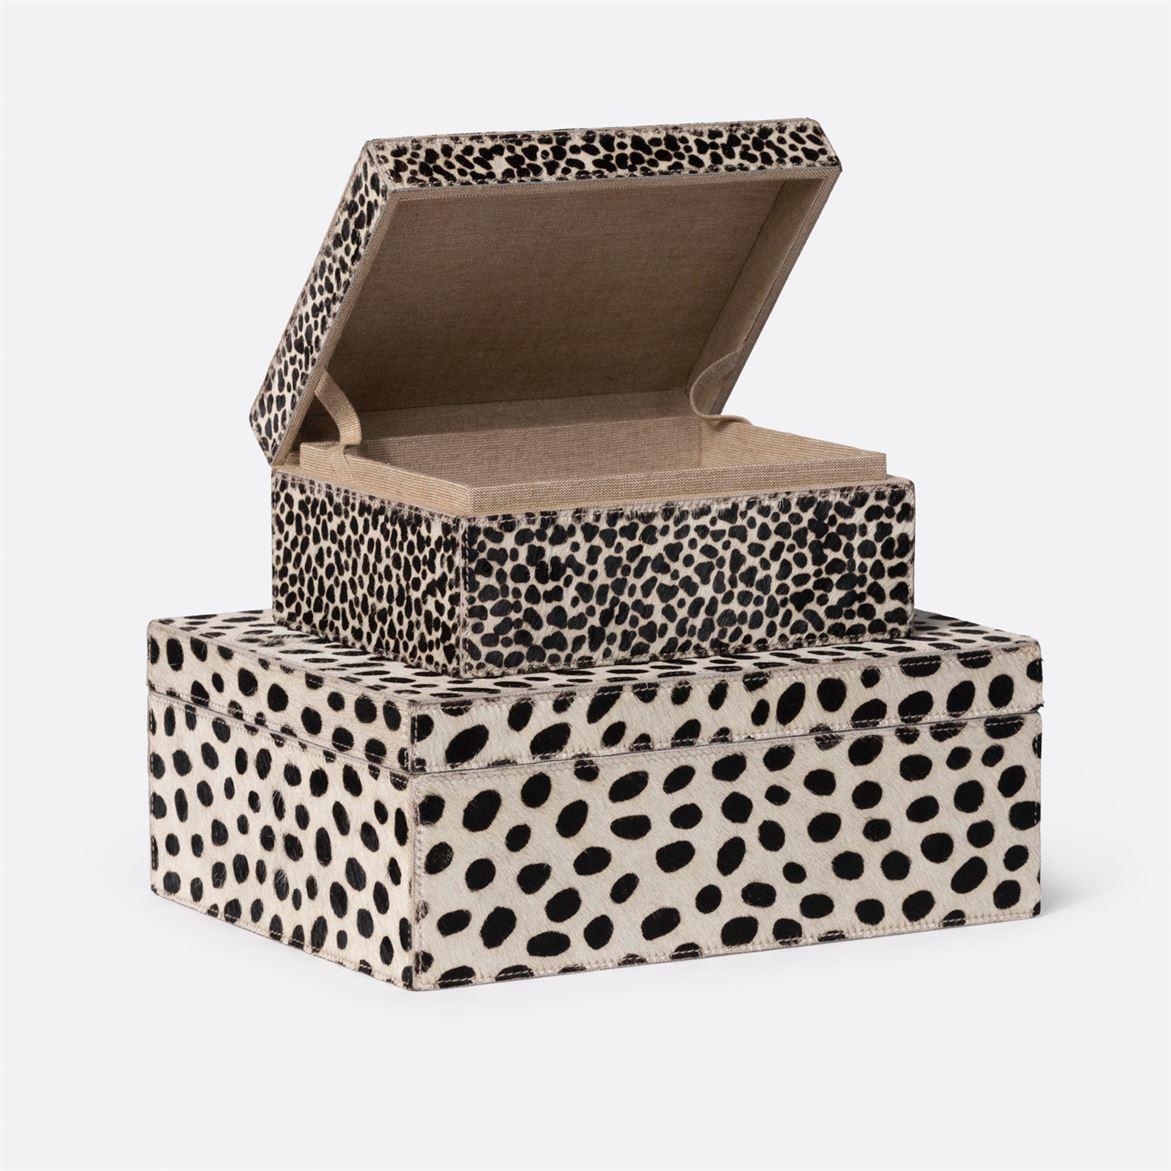 Deville Patterned Hide Boxes Set